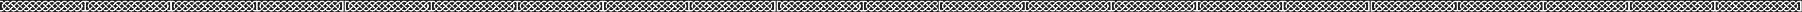 Bands-01 color 202020 12px